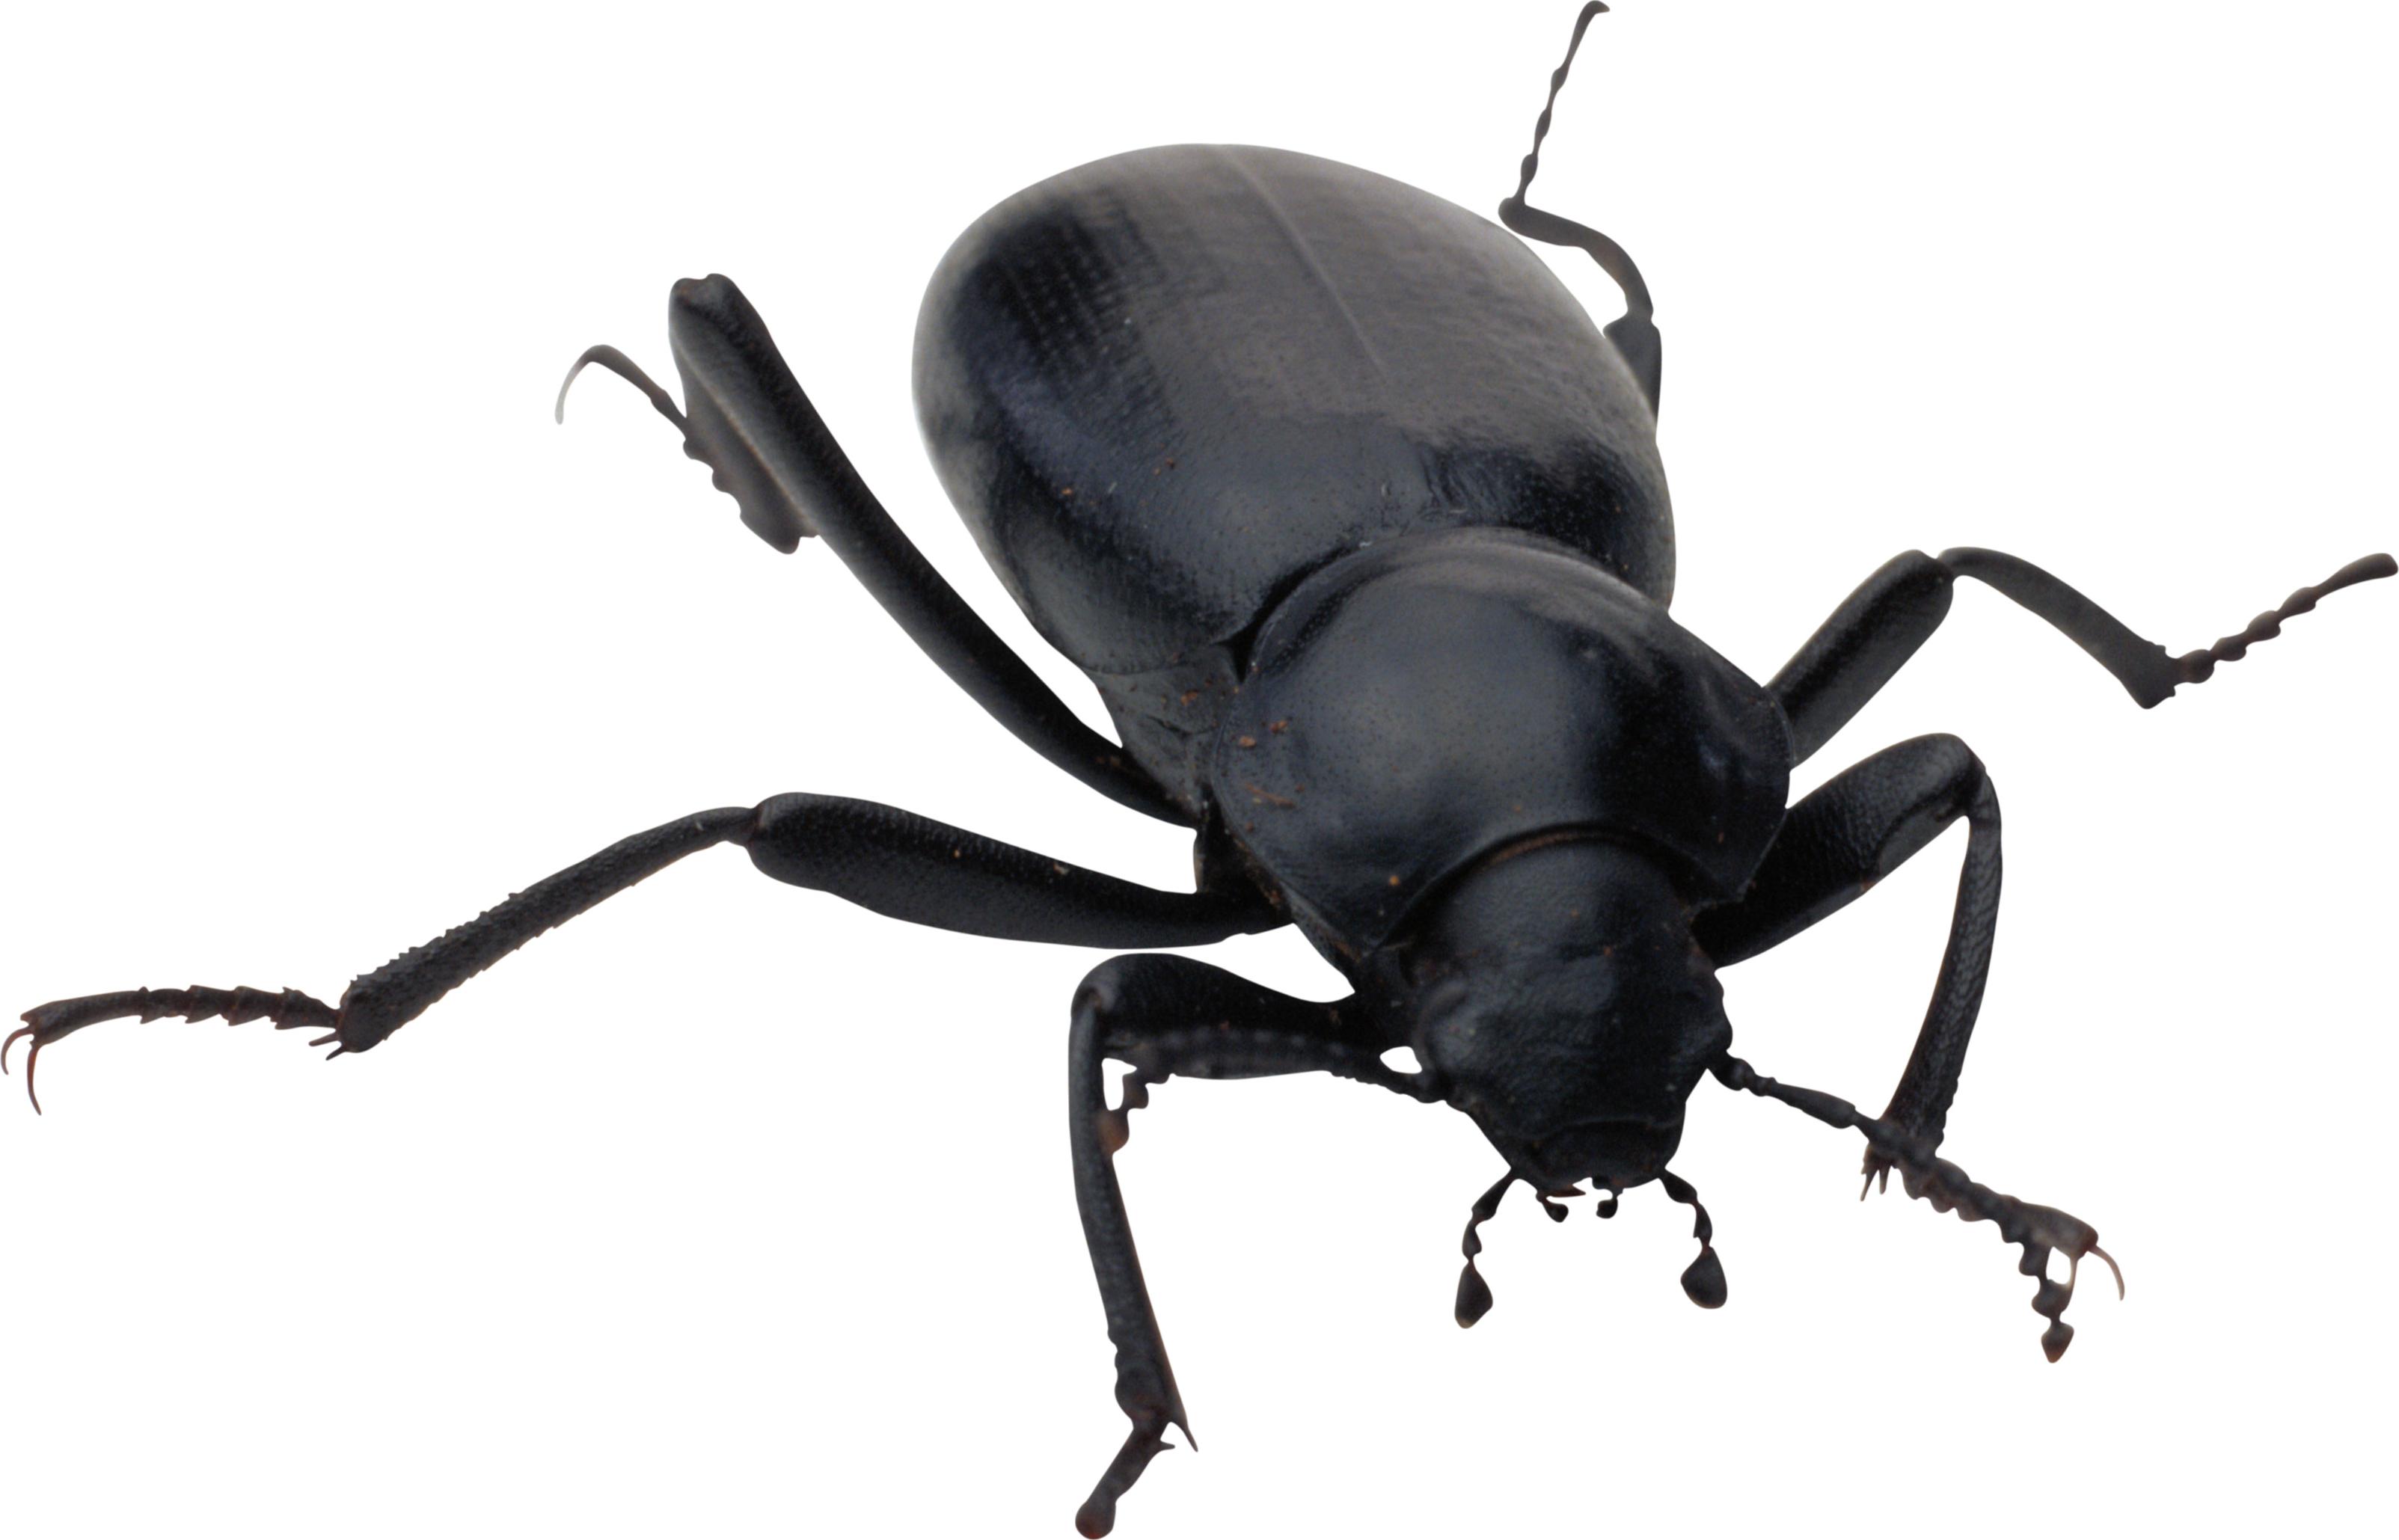 bug png image purepng free transparent cc0 png image library